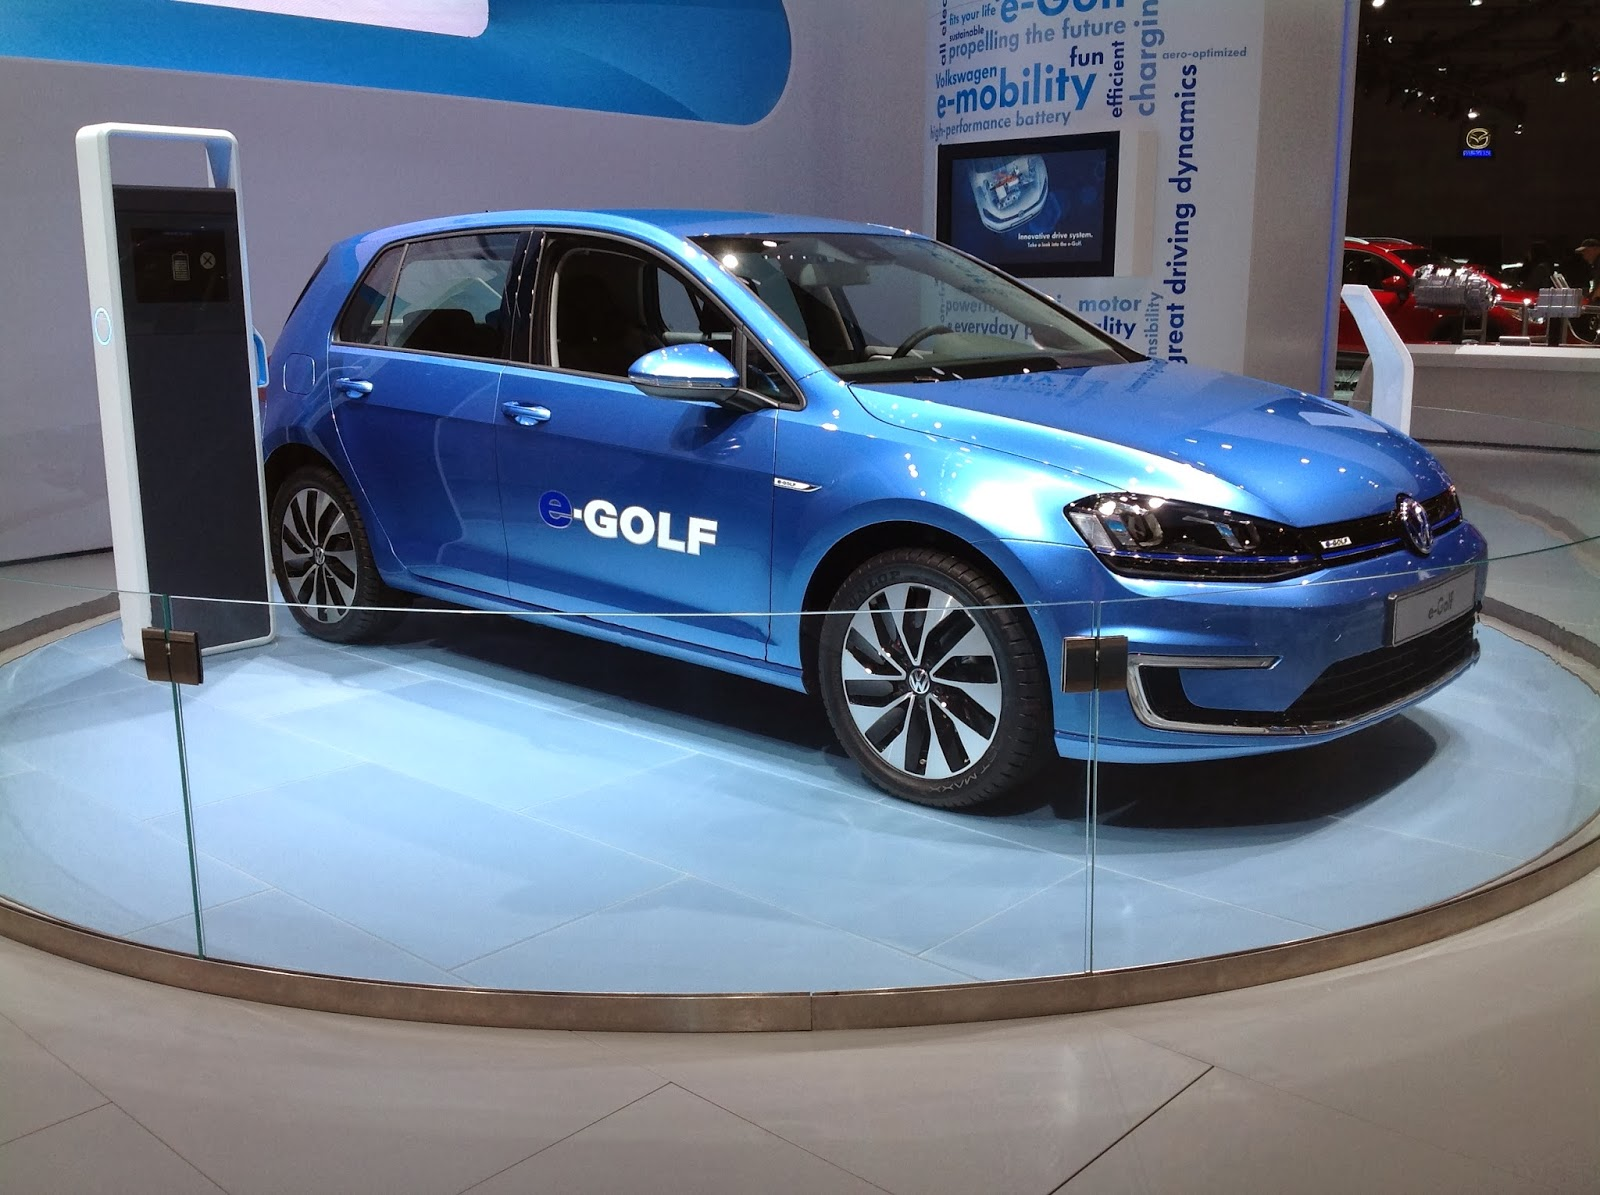 das auto stohlman vw tysons corner va  golf  electric boogie woogie woogie